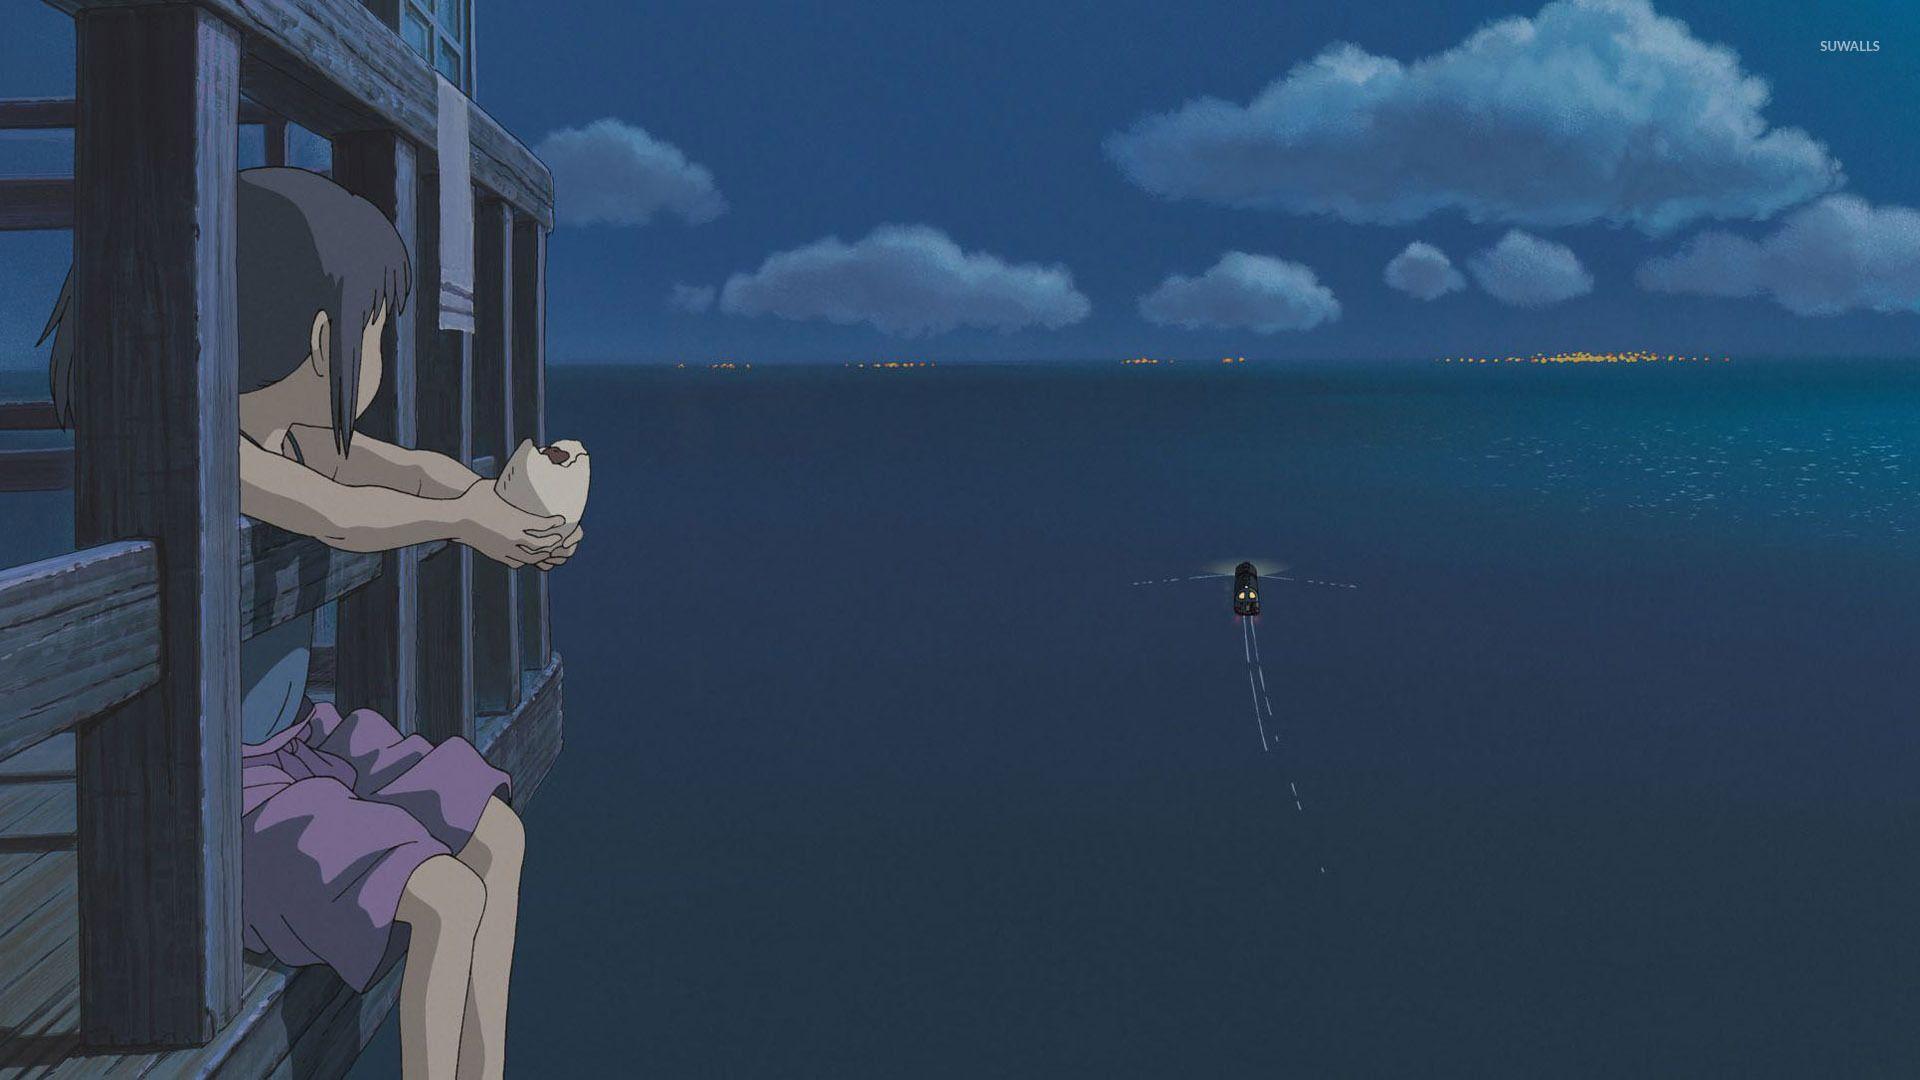 Spirited Away Studio Ghibli Desktop Wallpapers Top Free Spirited Away Studio Ghibli Desktop Backgrounds Wallpaperaccess